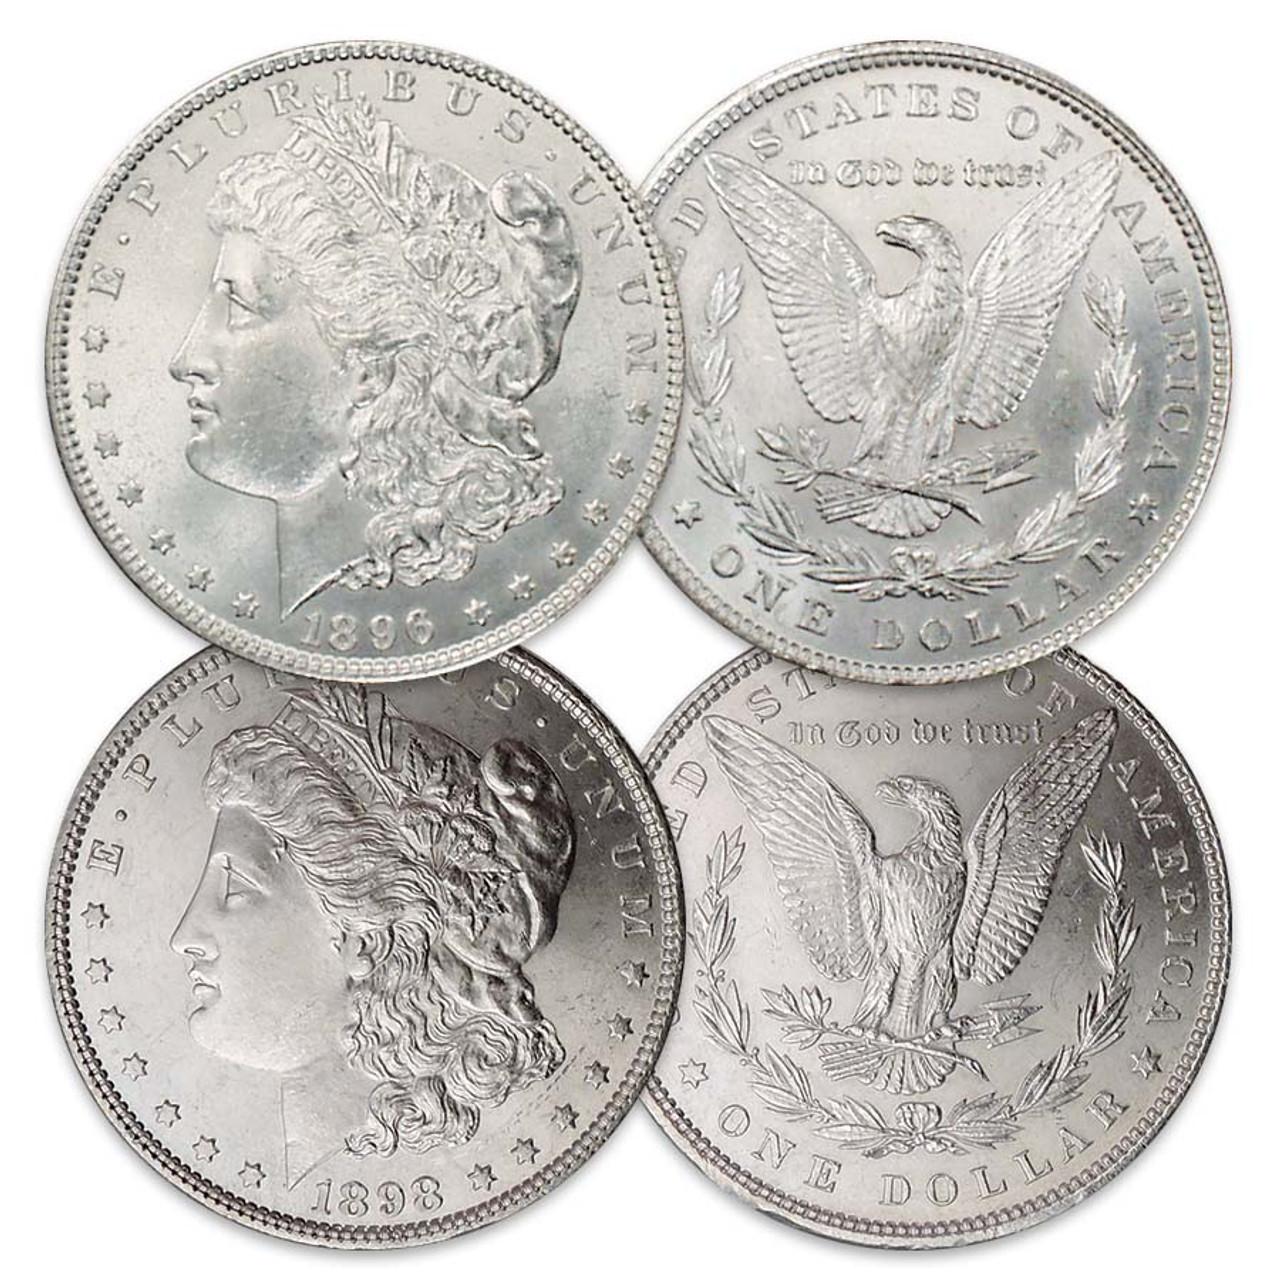 1896-P & 1898-P Morgan Silver Dollar Pair Brilliant Uncirculated